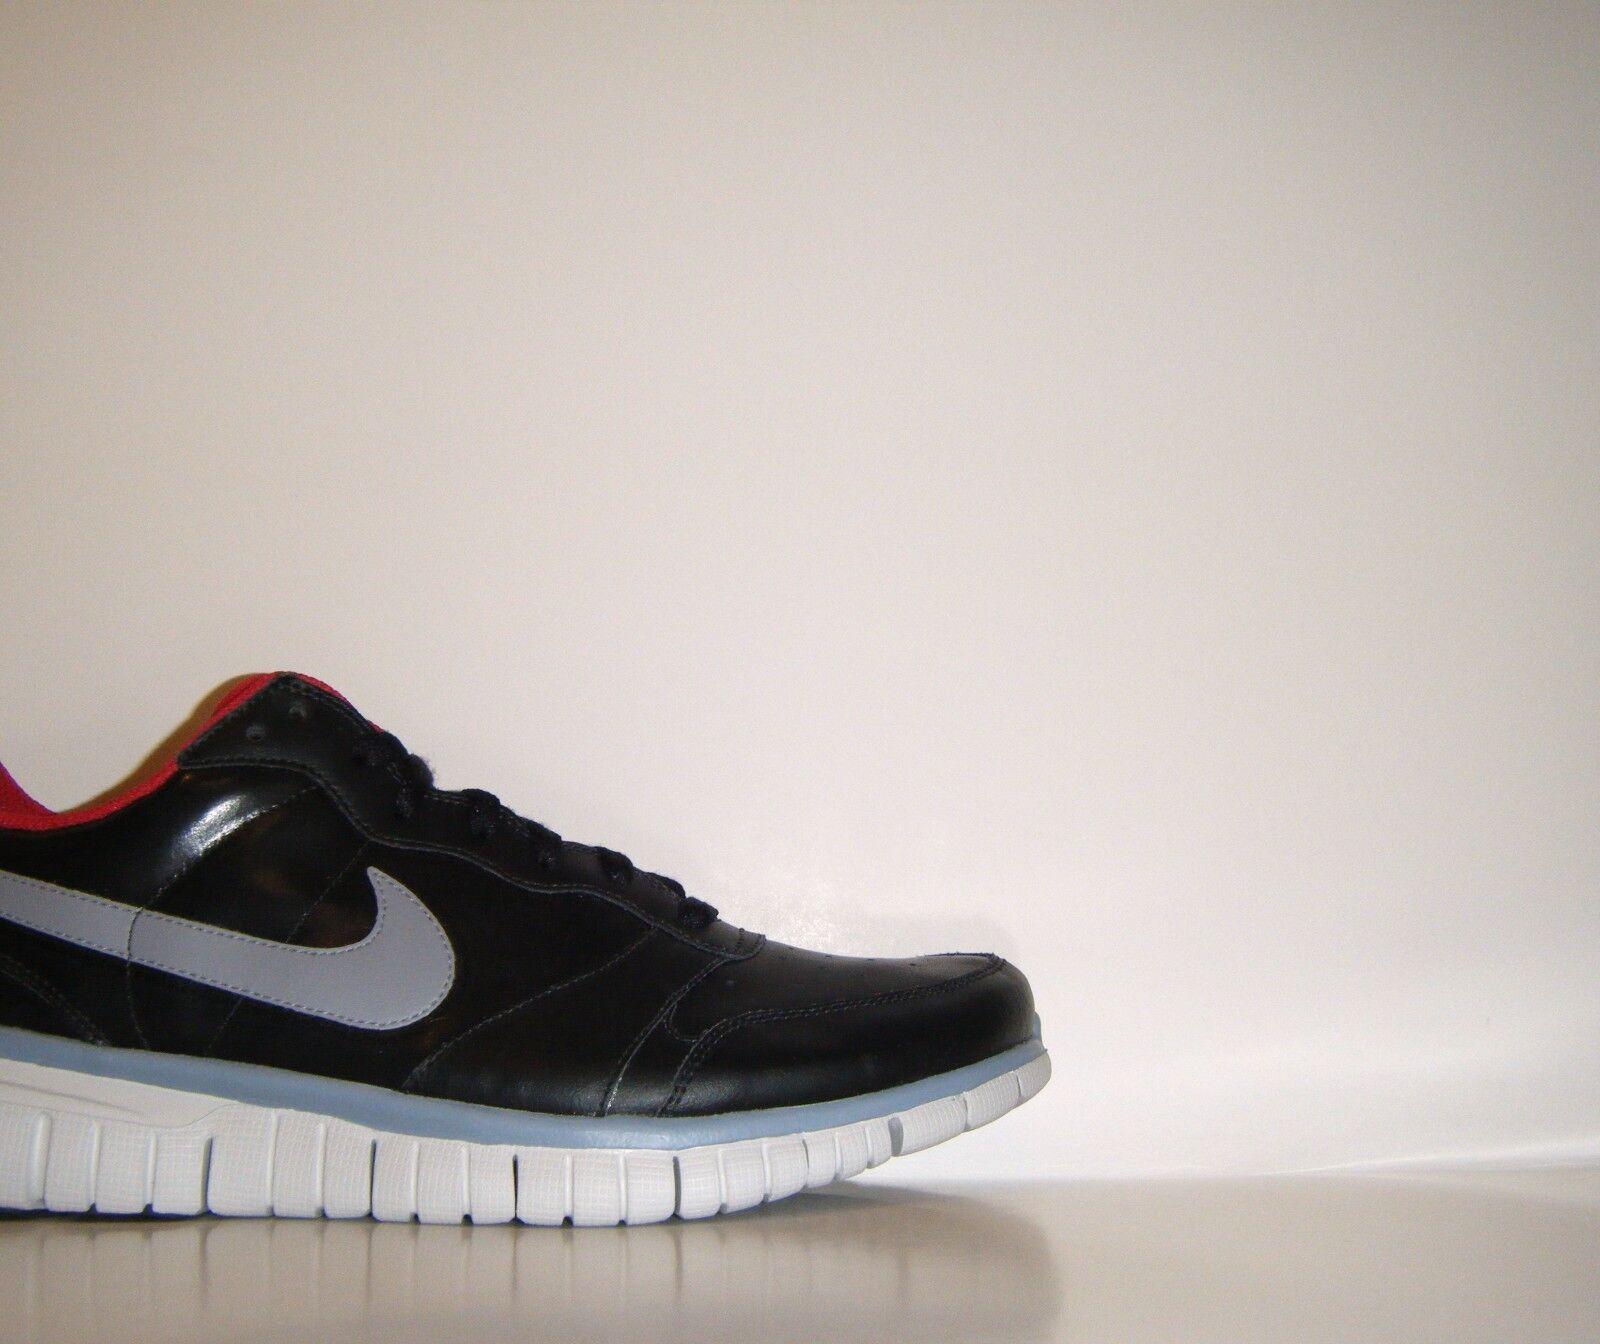 DS 2008 Nike  Free Ace NM Campione non identificato Sz.9 Promo Tennis Running Trainer  economico